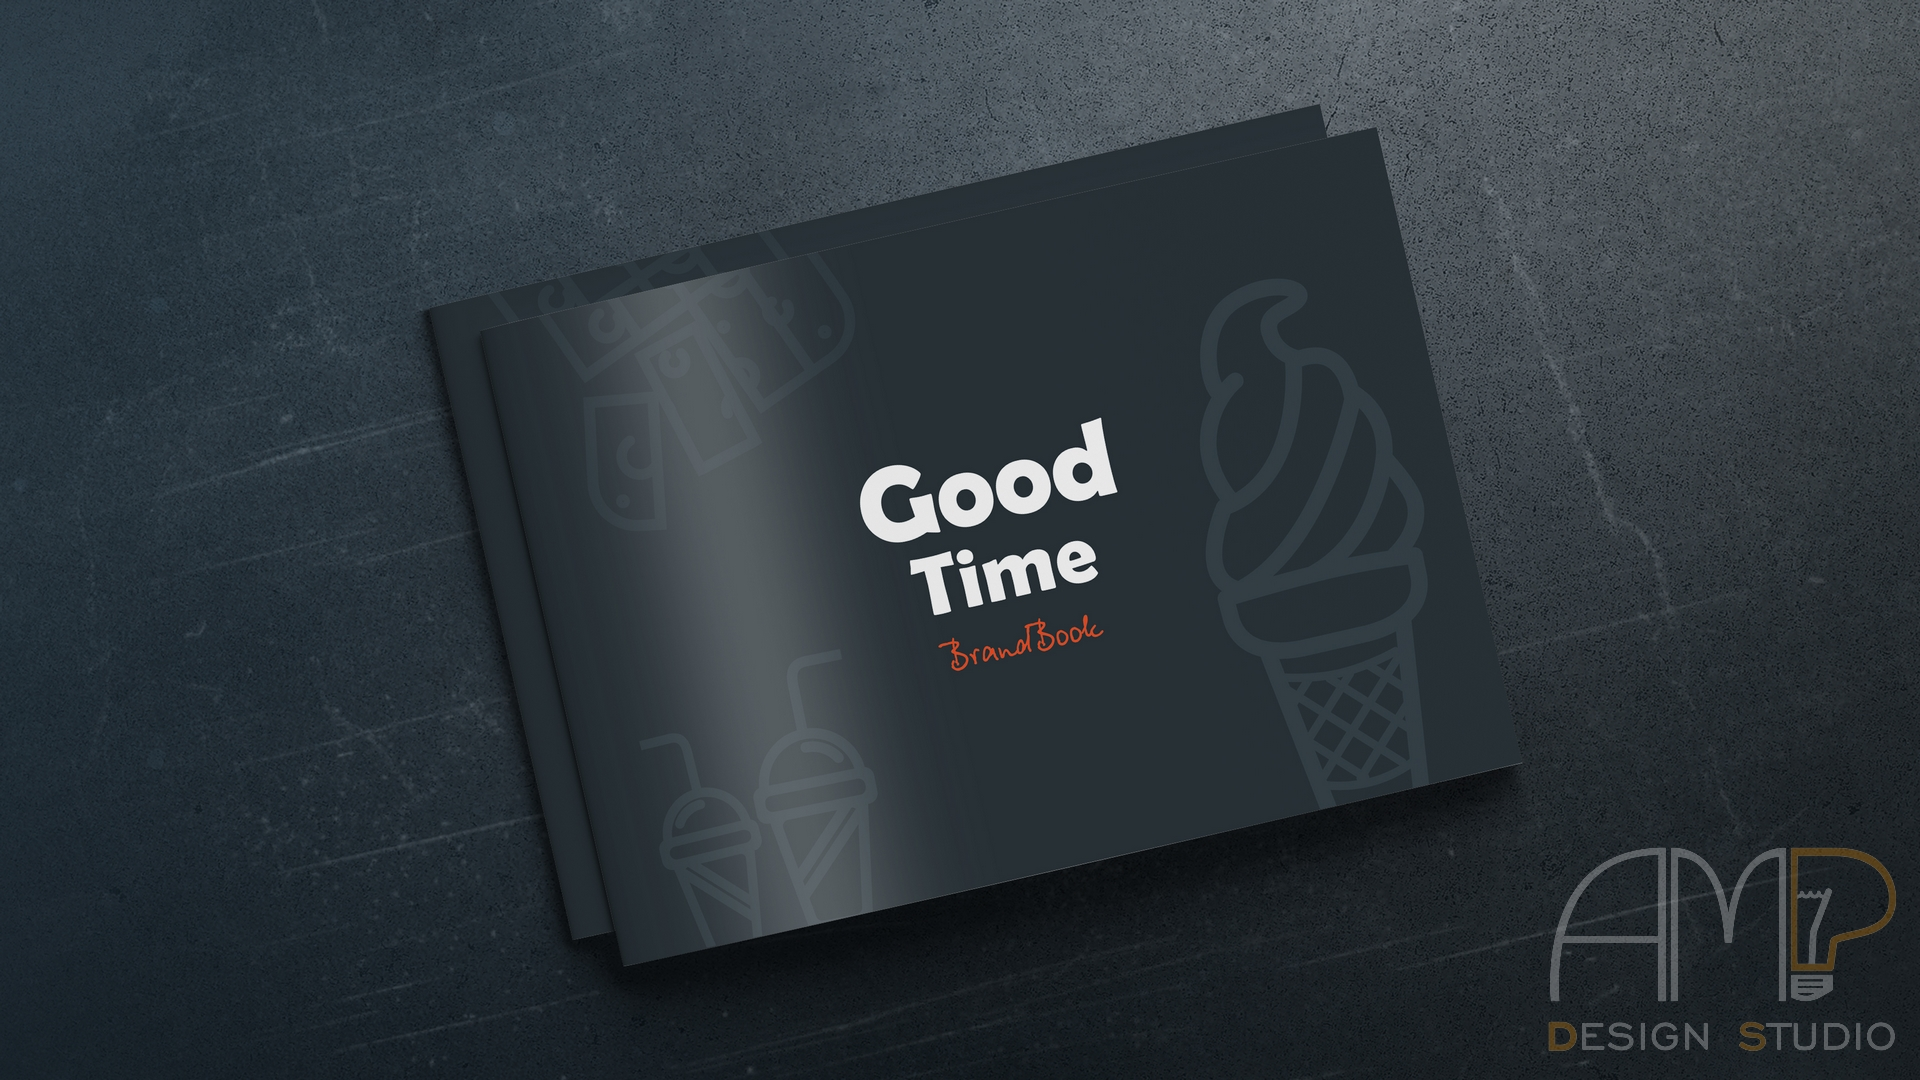 Brandbook GoodTime 1